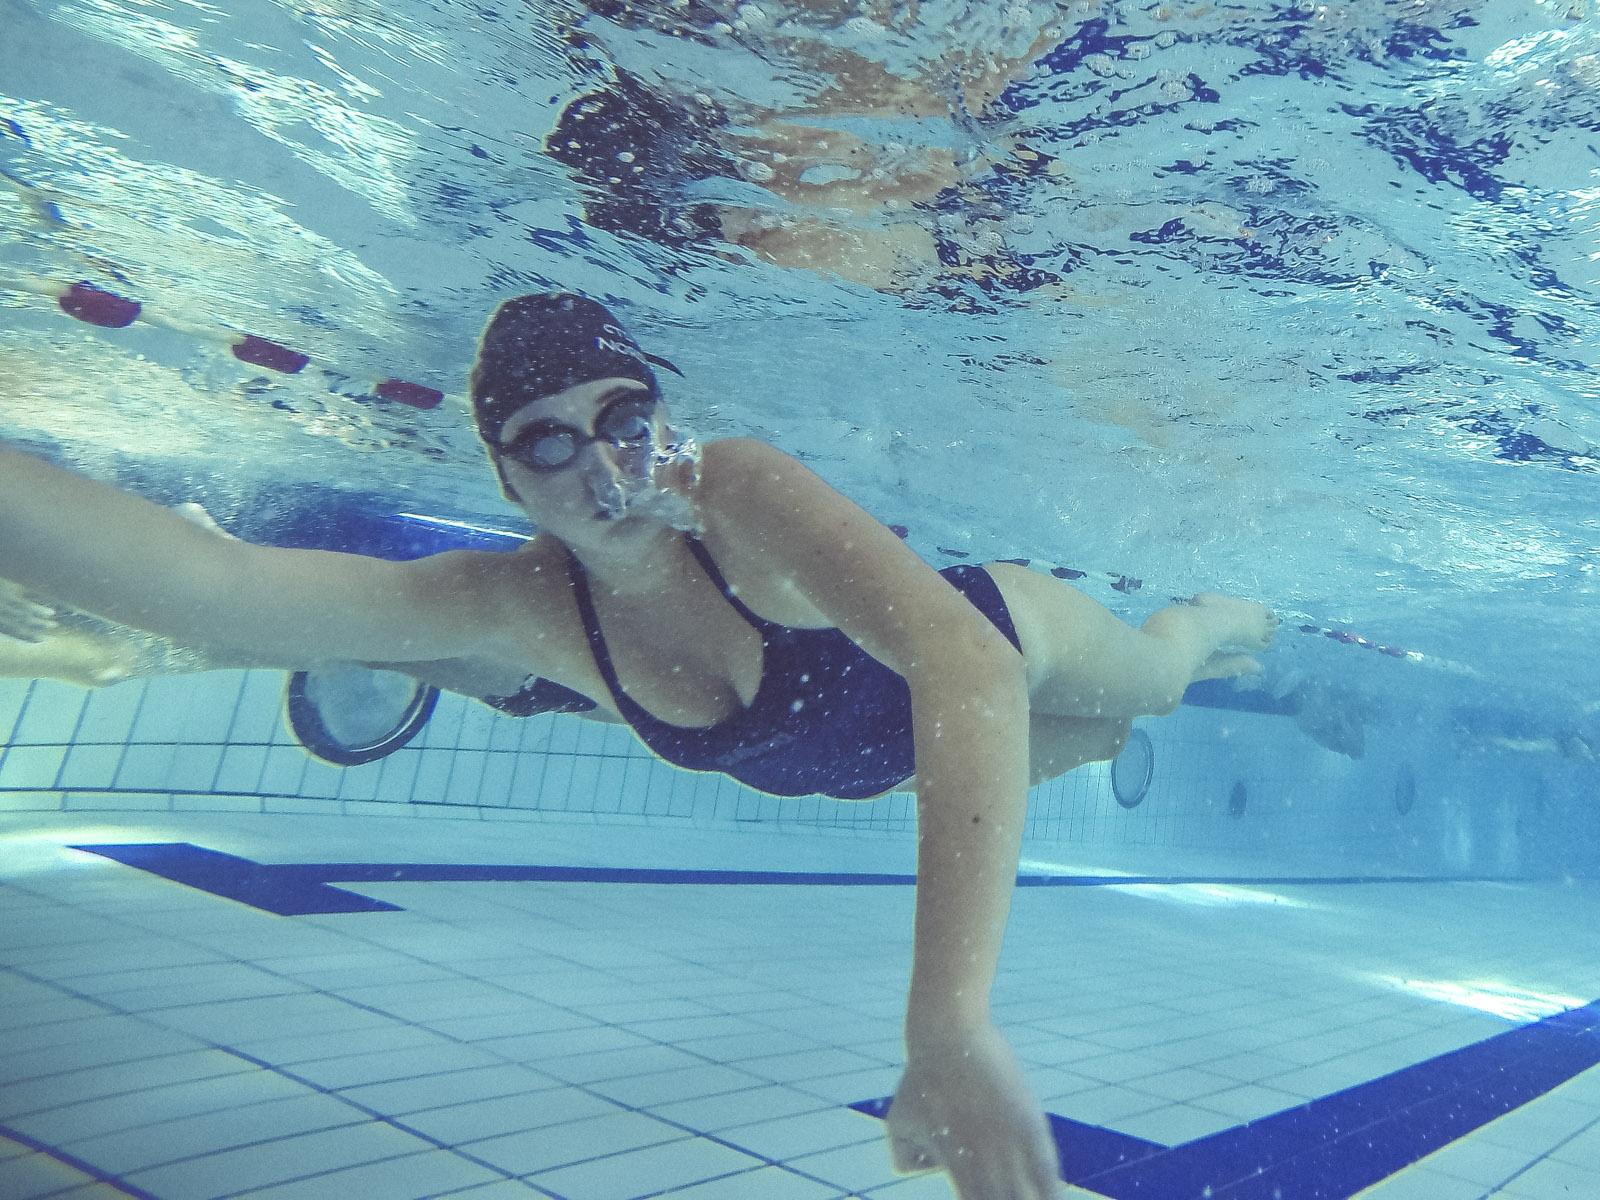 Cours de natation ados club nautique lambersartois for Piscine de molenbeek cours de natation